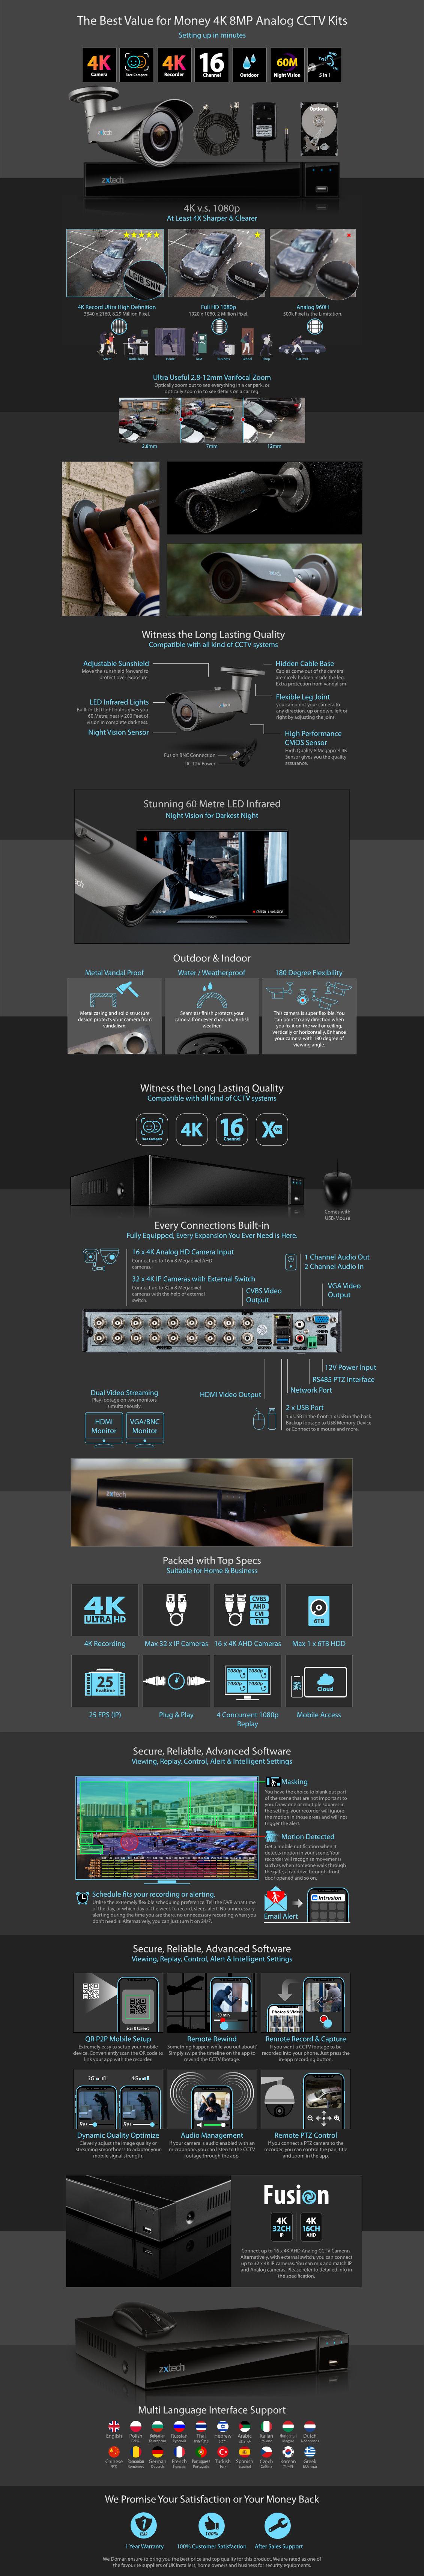 Zxtech 11x 8MP 4K-Lite UHD 60M Night Vision 2.8-12mm Varifocal Bullet Cameras 16CH DVR CCTV Kit | AX11G16X